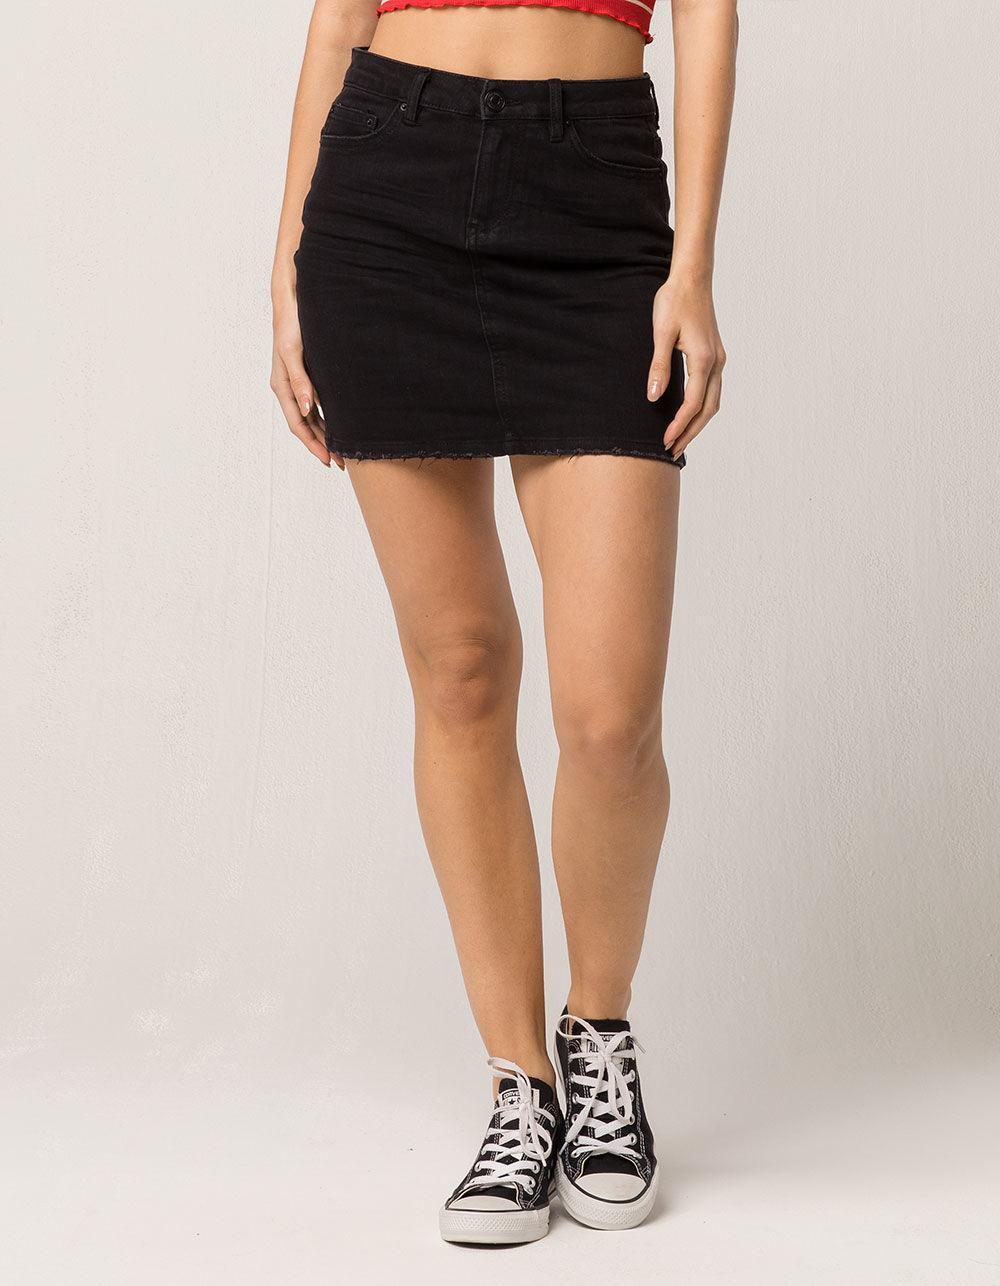 c8b0531e80 Almost Famous Mid Rise Womens Denim Skirt in Black - Lyst